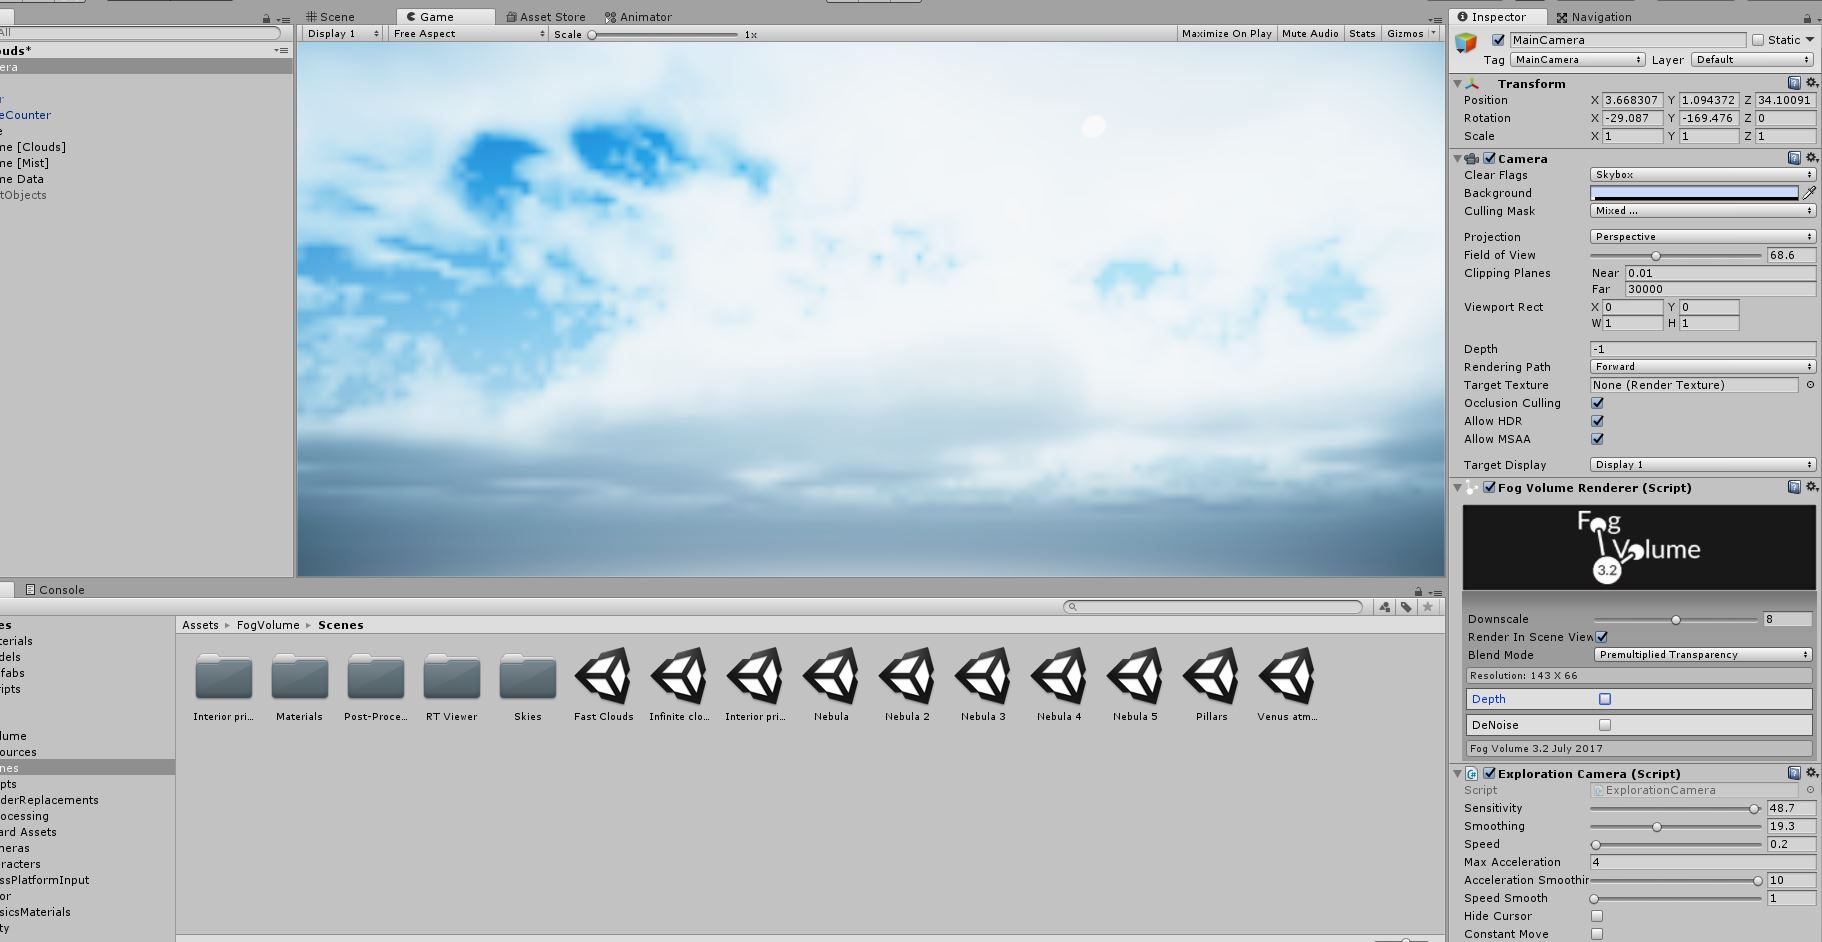 pixelated_clouds.JPG